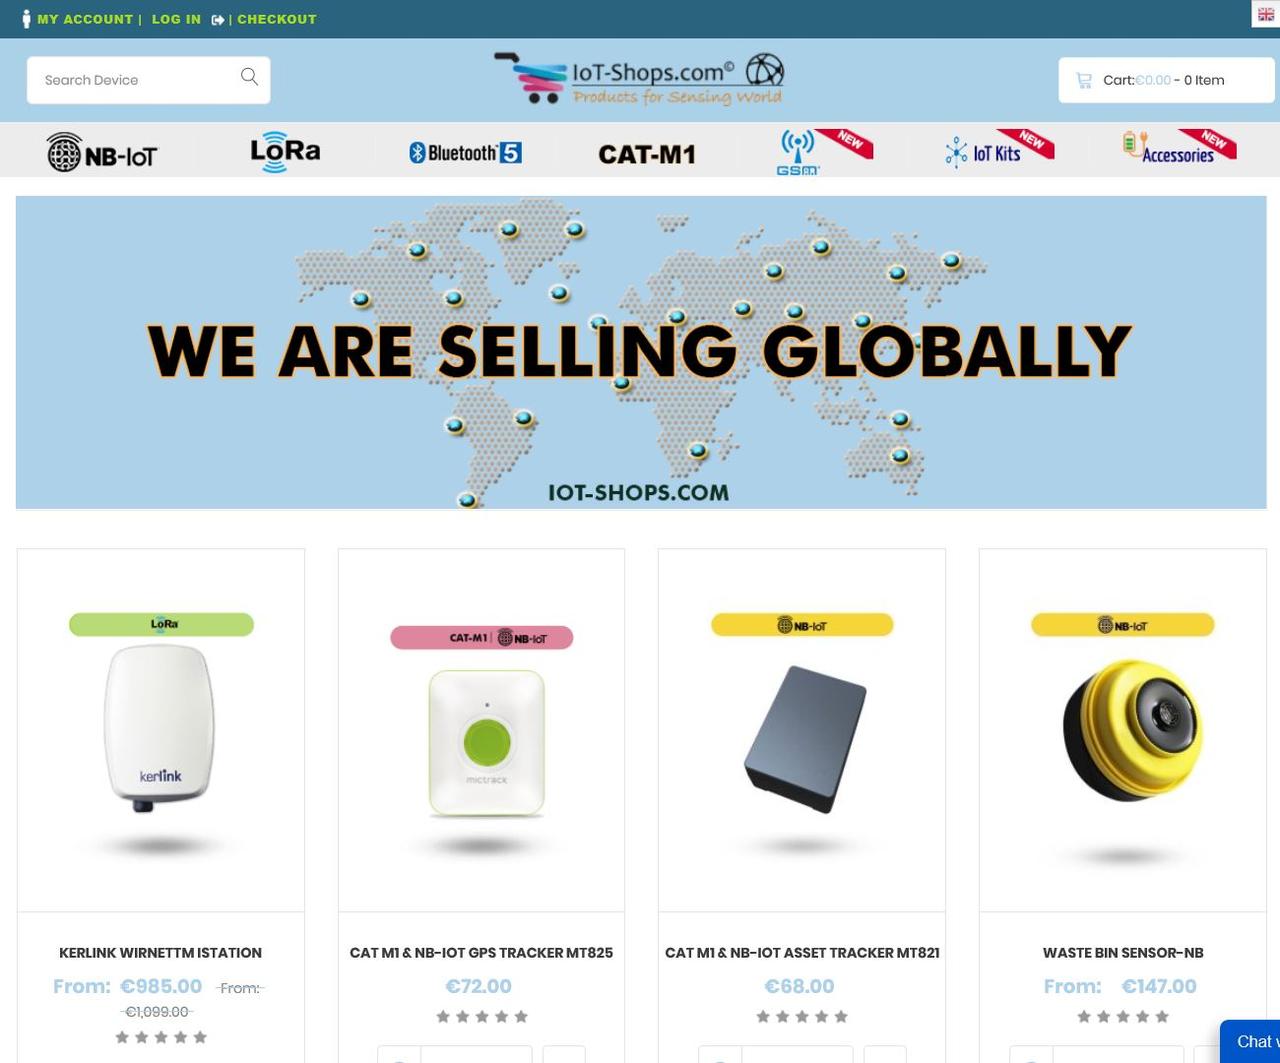 IoT-Shops